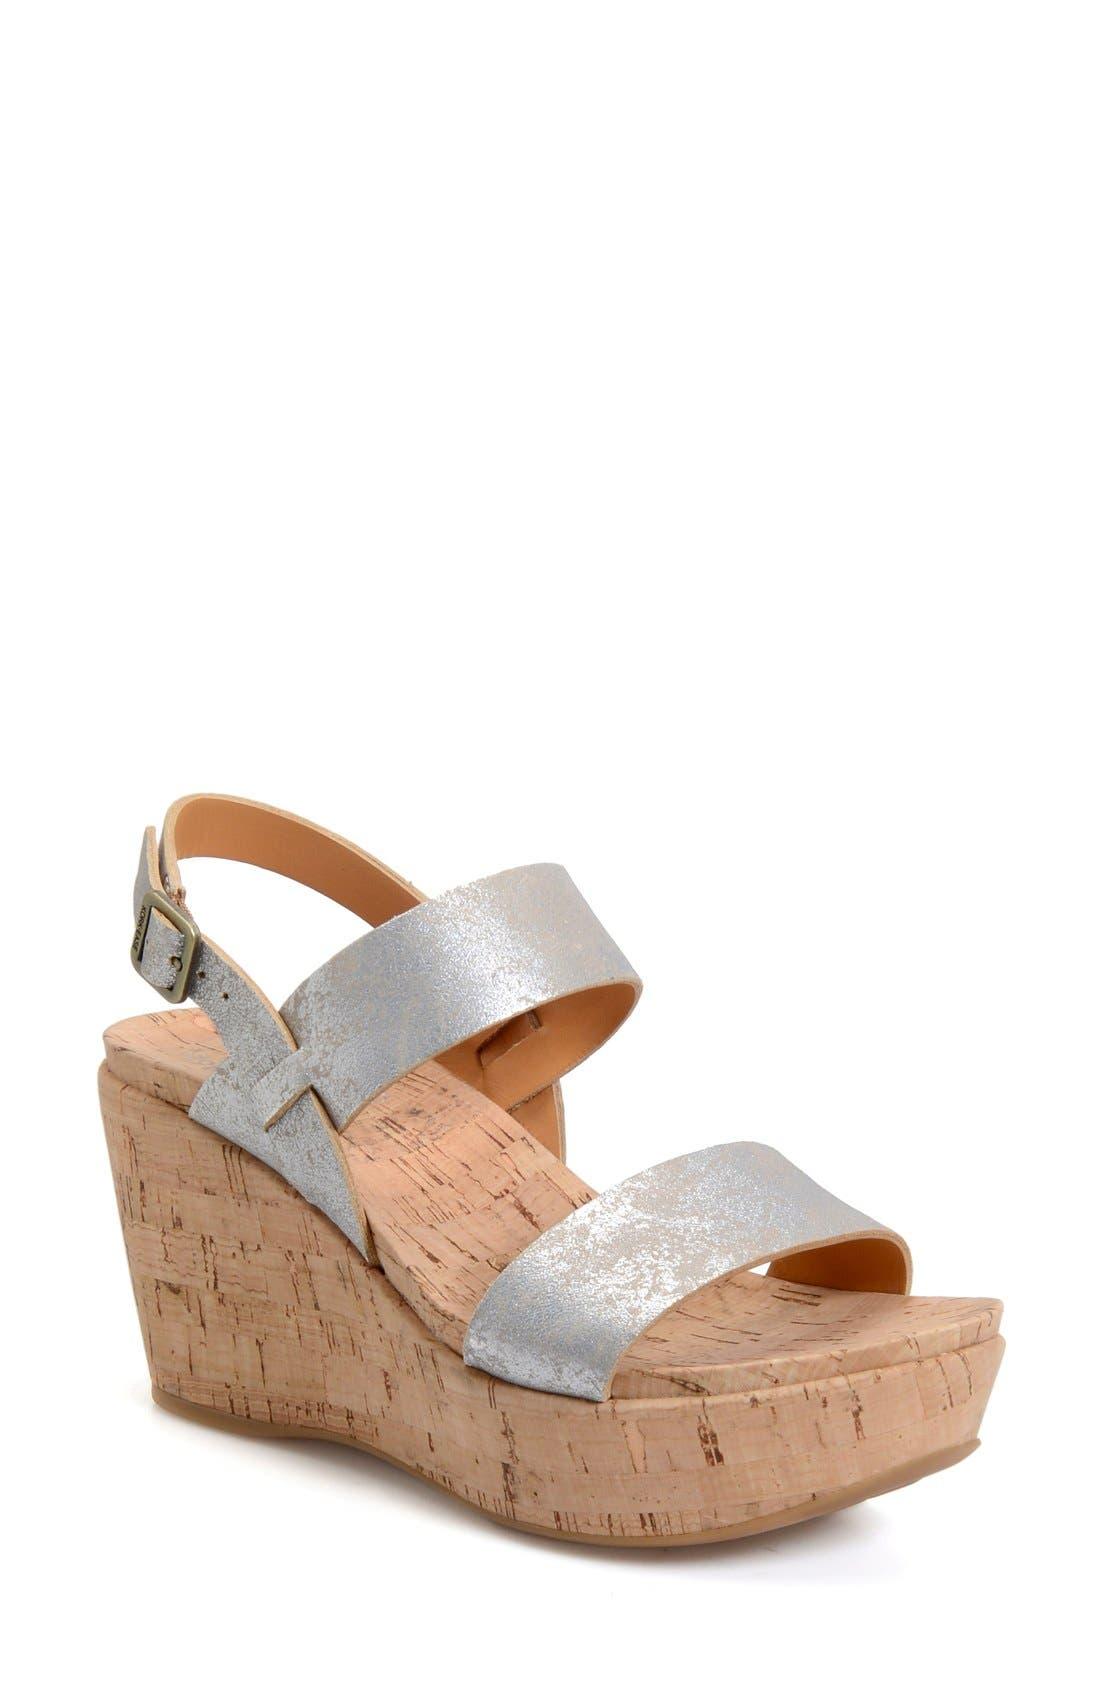 'Austin' Slingback Wedge Sandal,                             Main thumbnail 5, color,